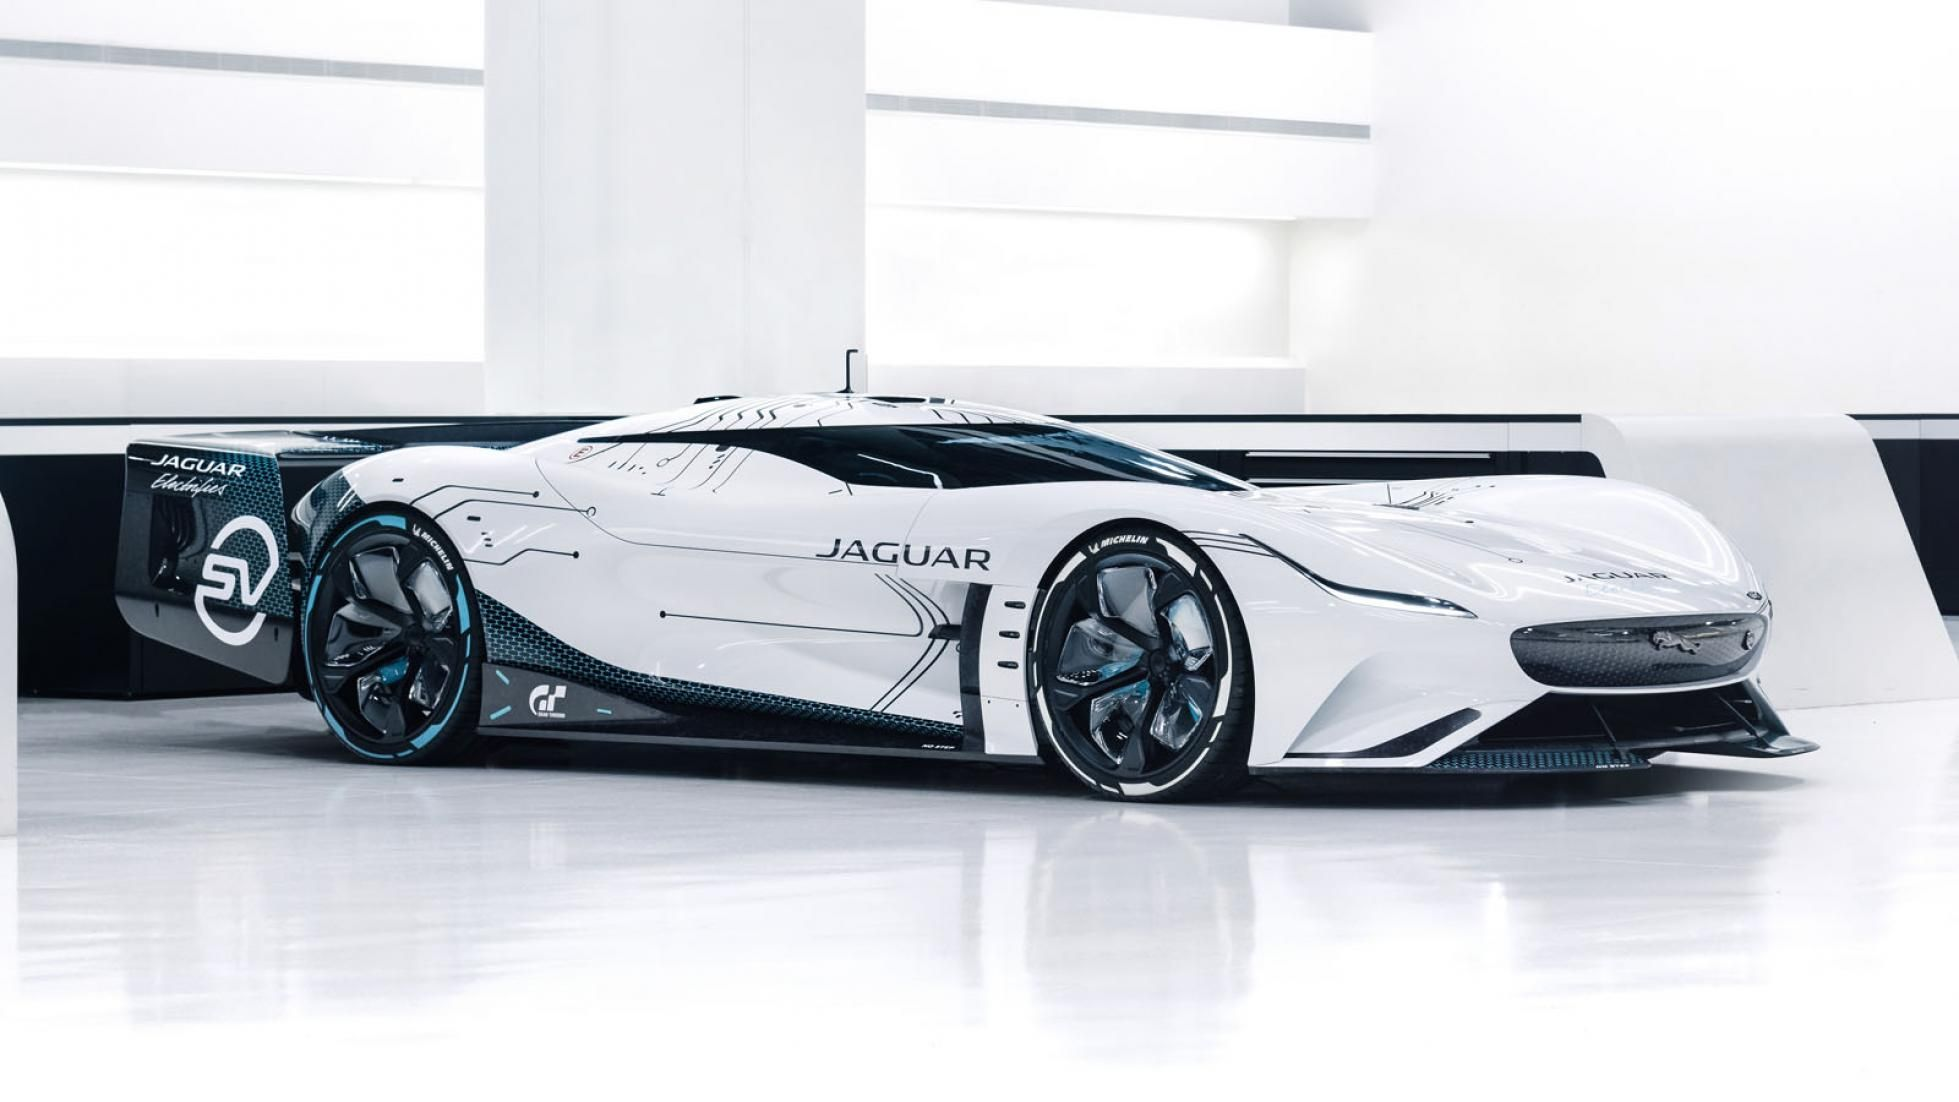 Jaguar Vision GT SV 12 carro elétrico, Gran Turismo, Gran Turismo Sport, GT, Jaguar, Jaguar Vision GT SV